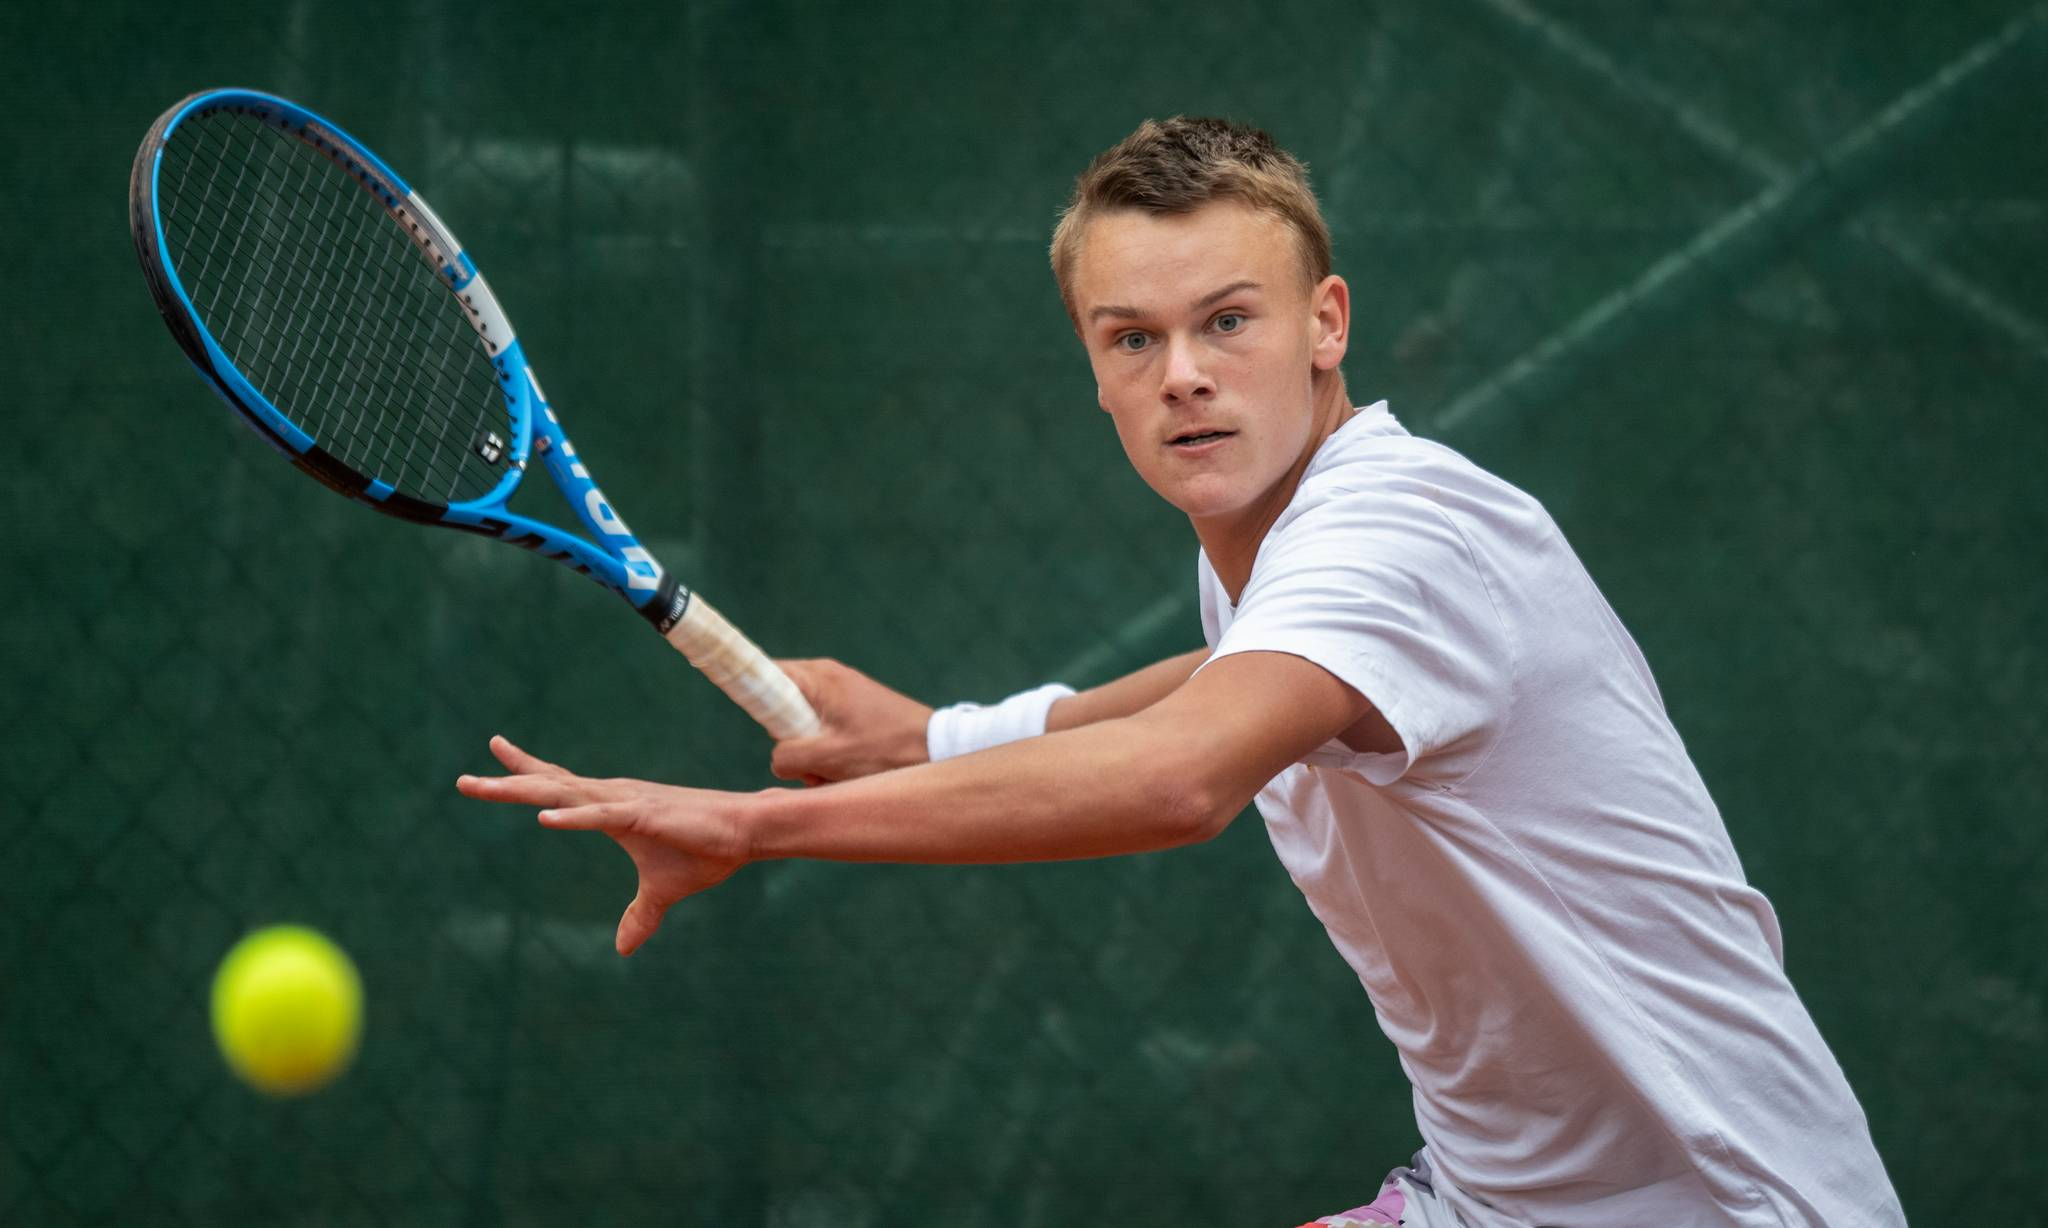 Swedish Open 2021: Radu Albot vs. Holger Rune Tennis Pick and Prediction